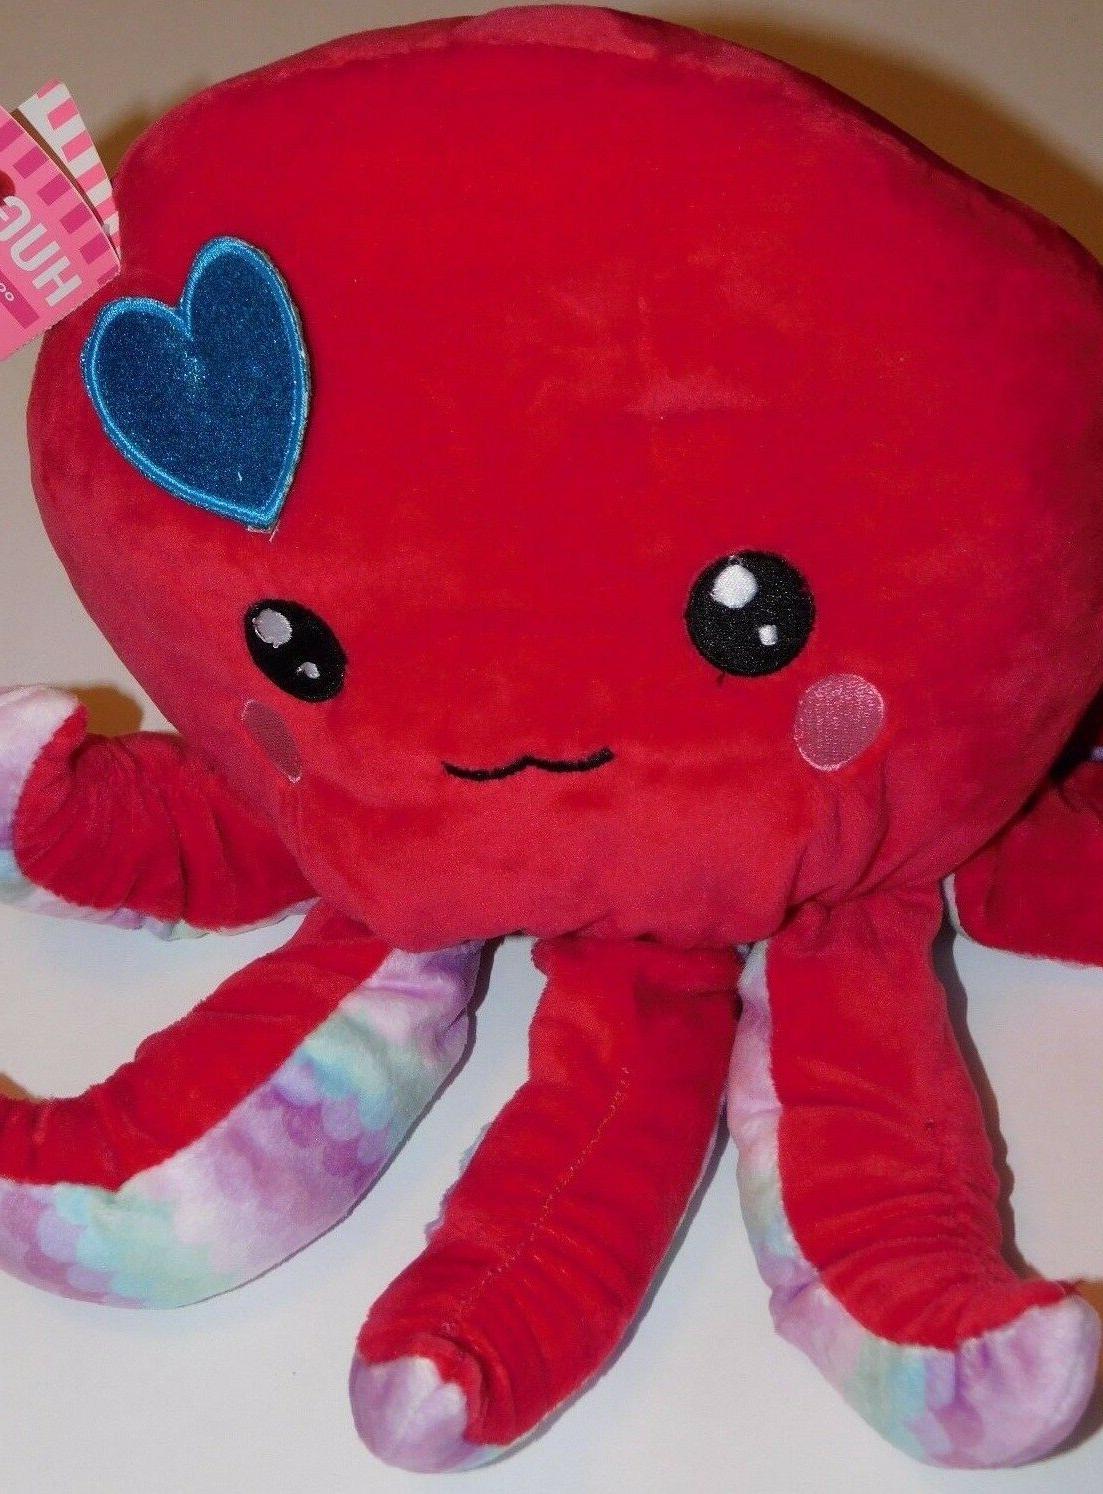 Octopus Red Sea Creature Ocean Life Stuffed Plush Animal 10i